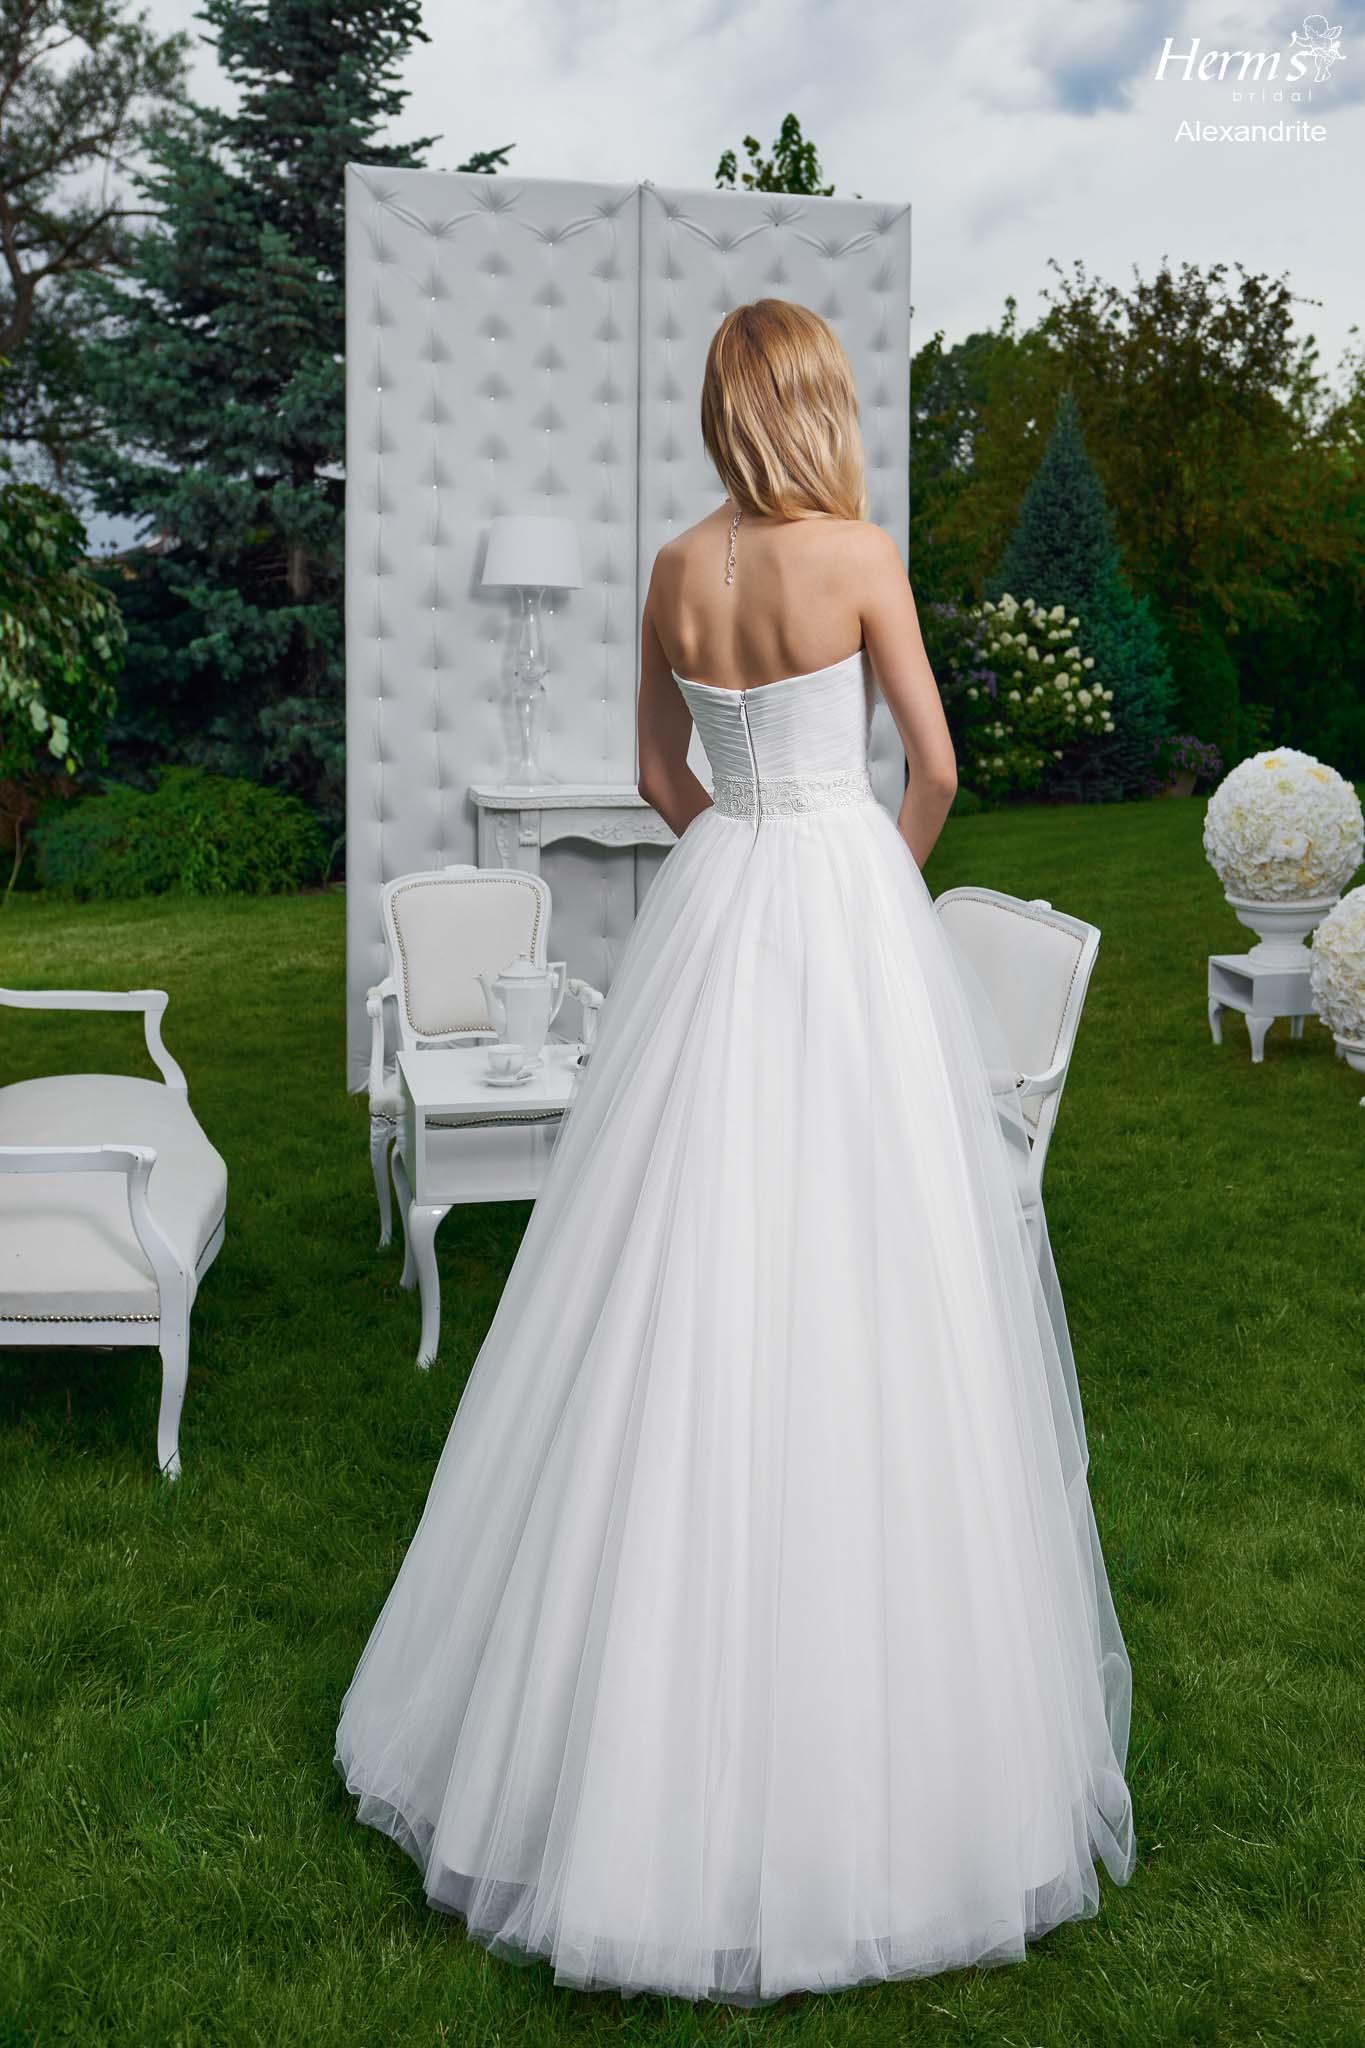 wedding dress Herm's Bridal Alexandrite